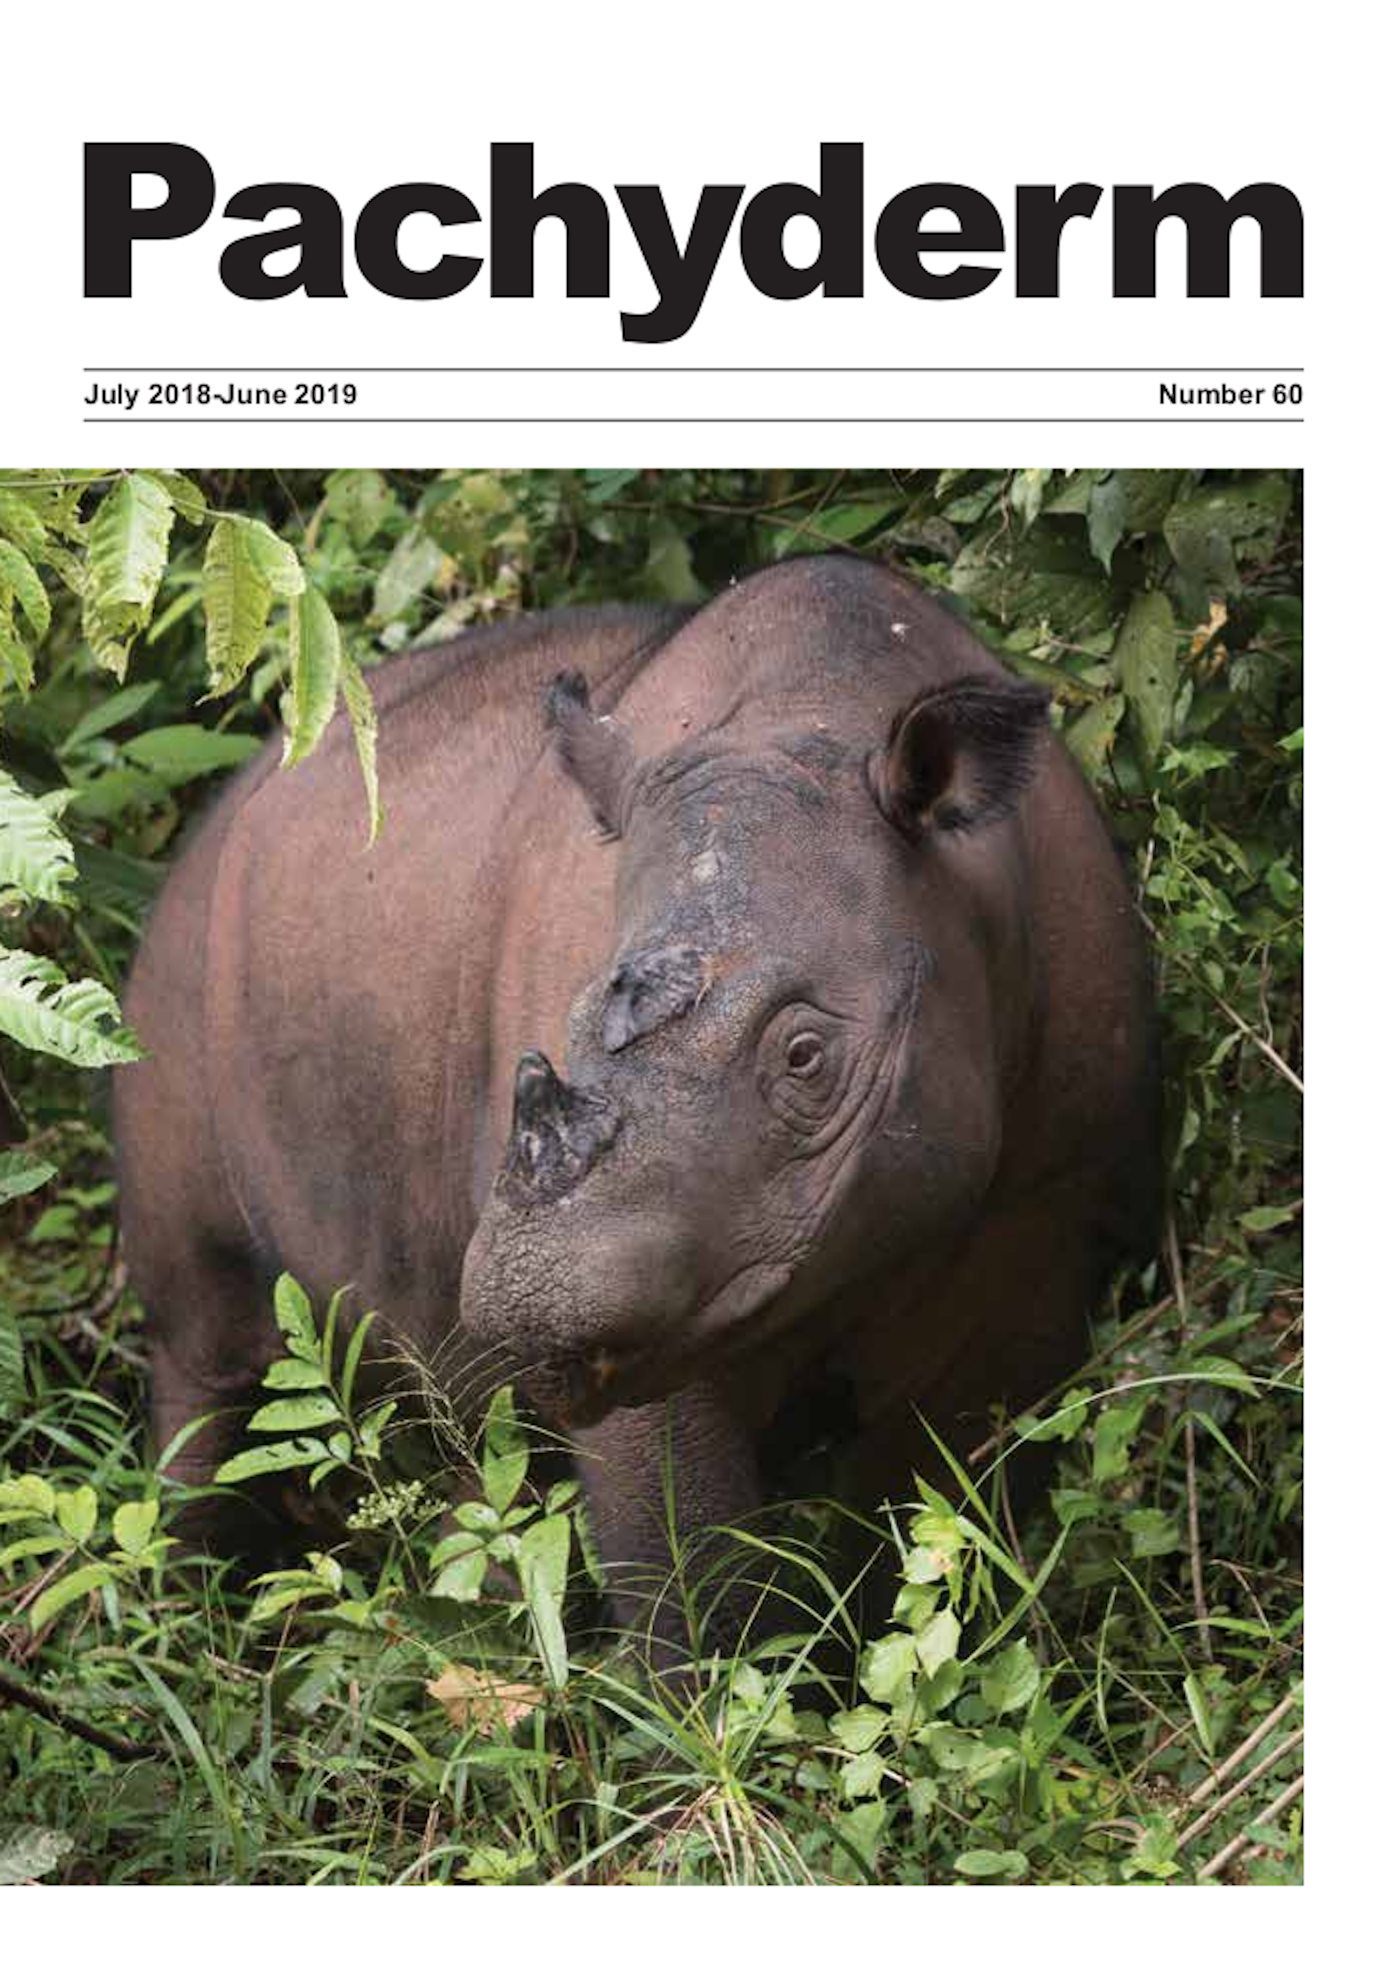 Cover caption: Sumatran Rhino at the Sumatran Rhino Sanctuary in Way Kambas National Park, Indonesia. ©International Rhino Foundation